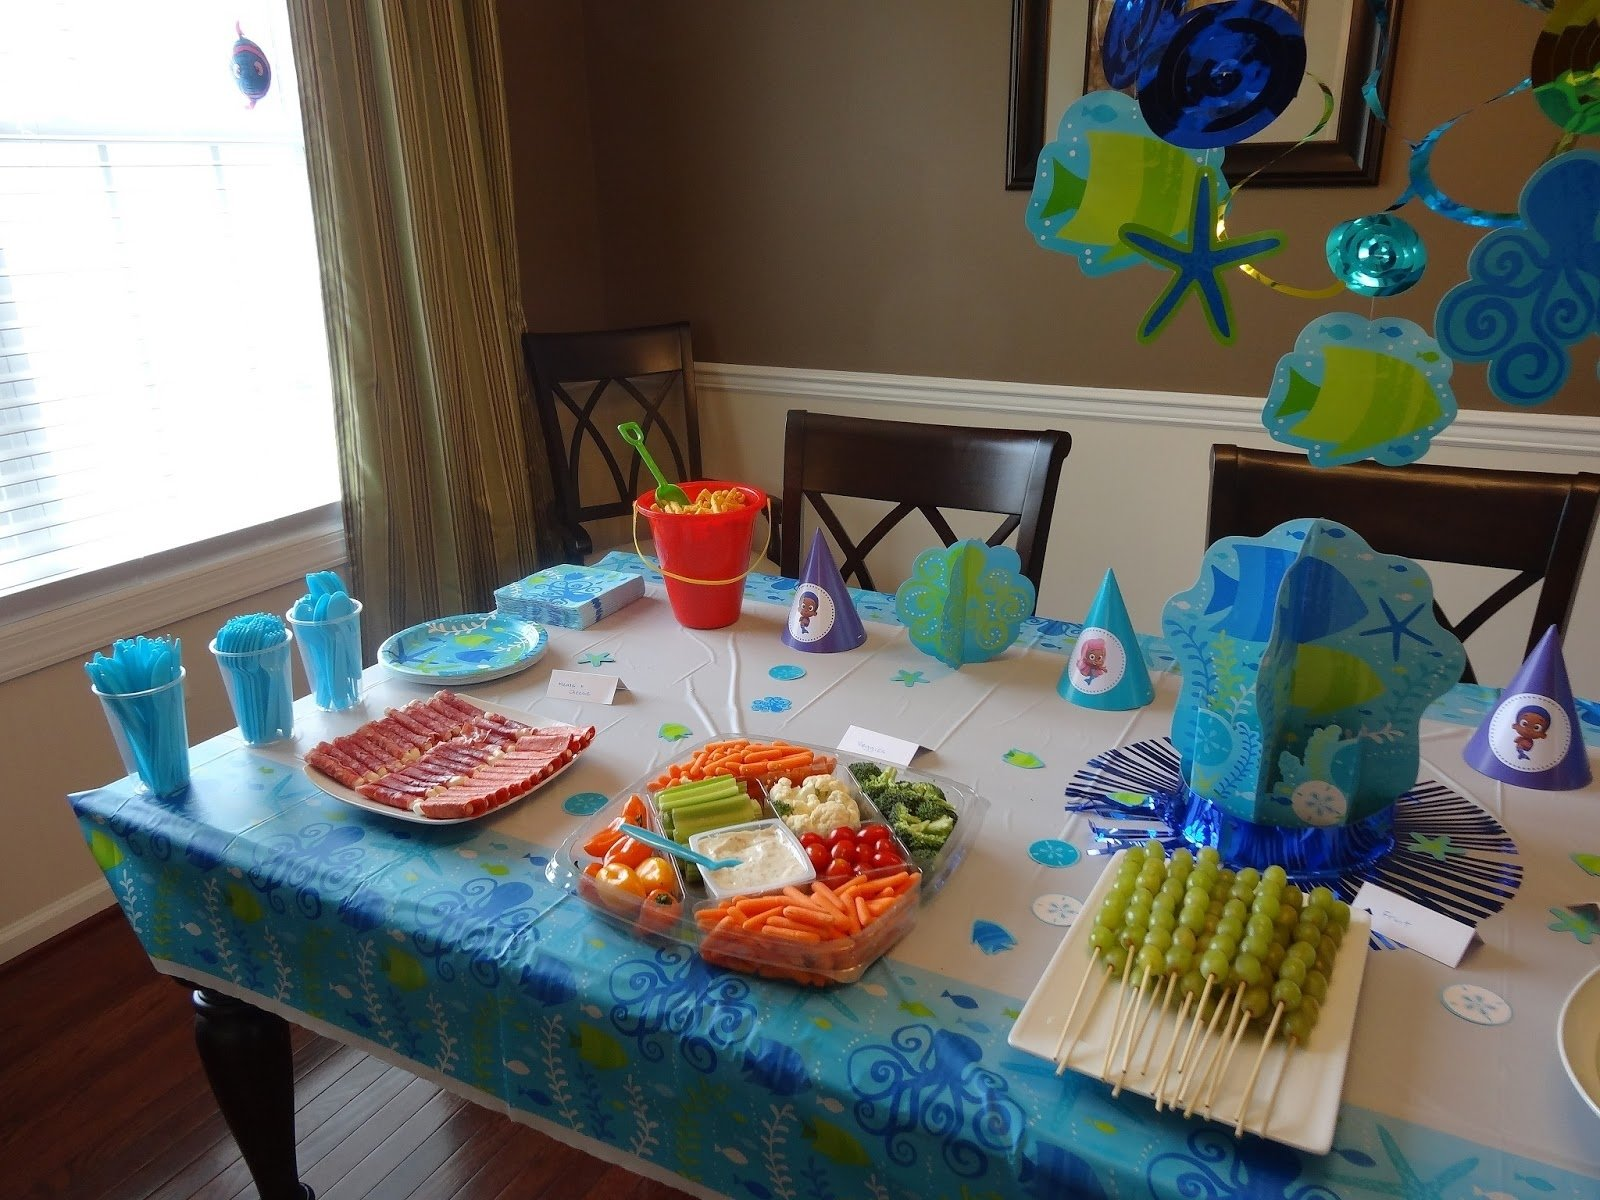 10 Gorgeous Bubble Guppies Party Food Ideas ideas bubble guppies birthday party bubble guppies themed 1 2020